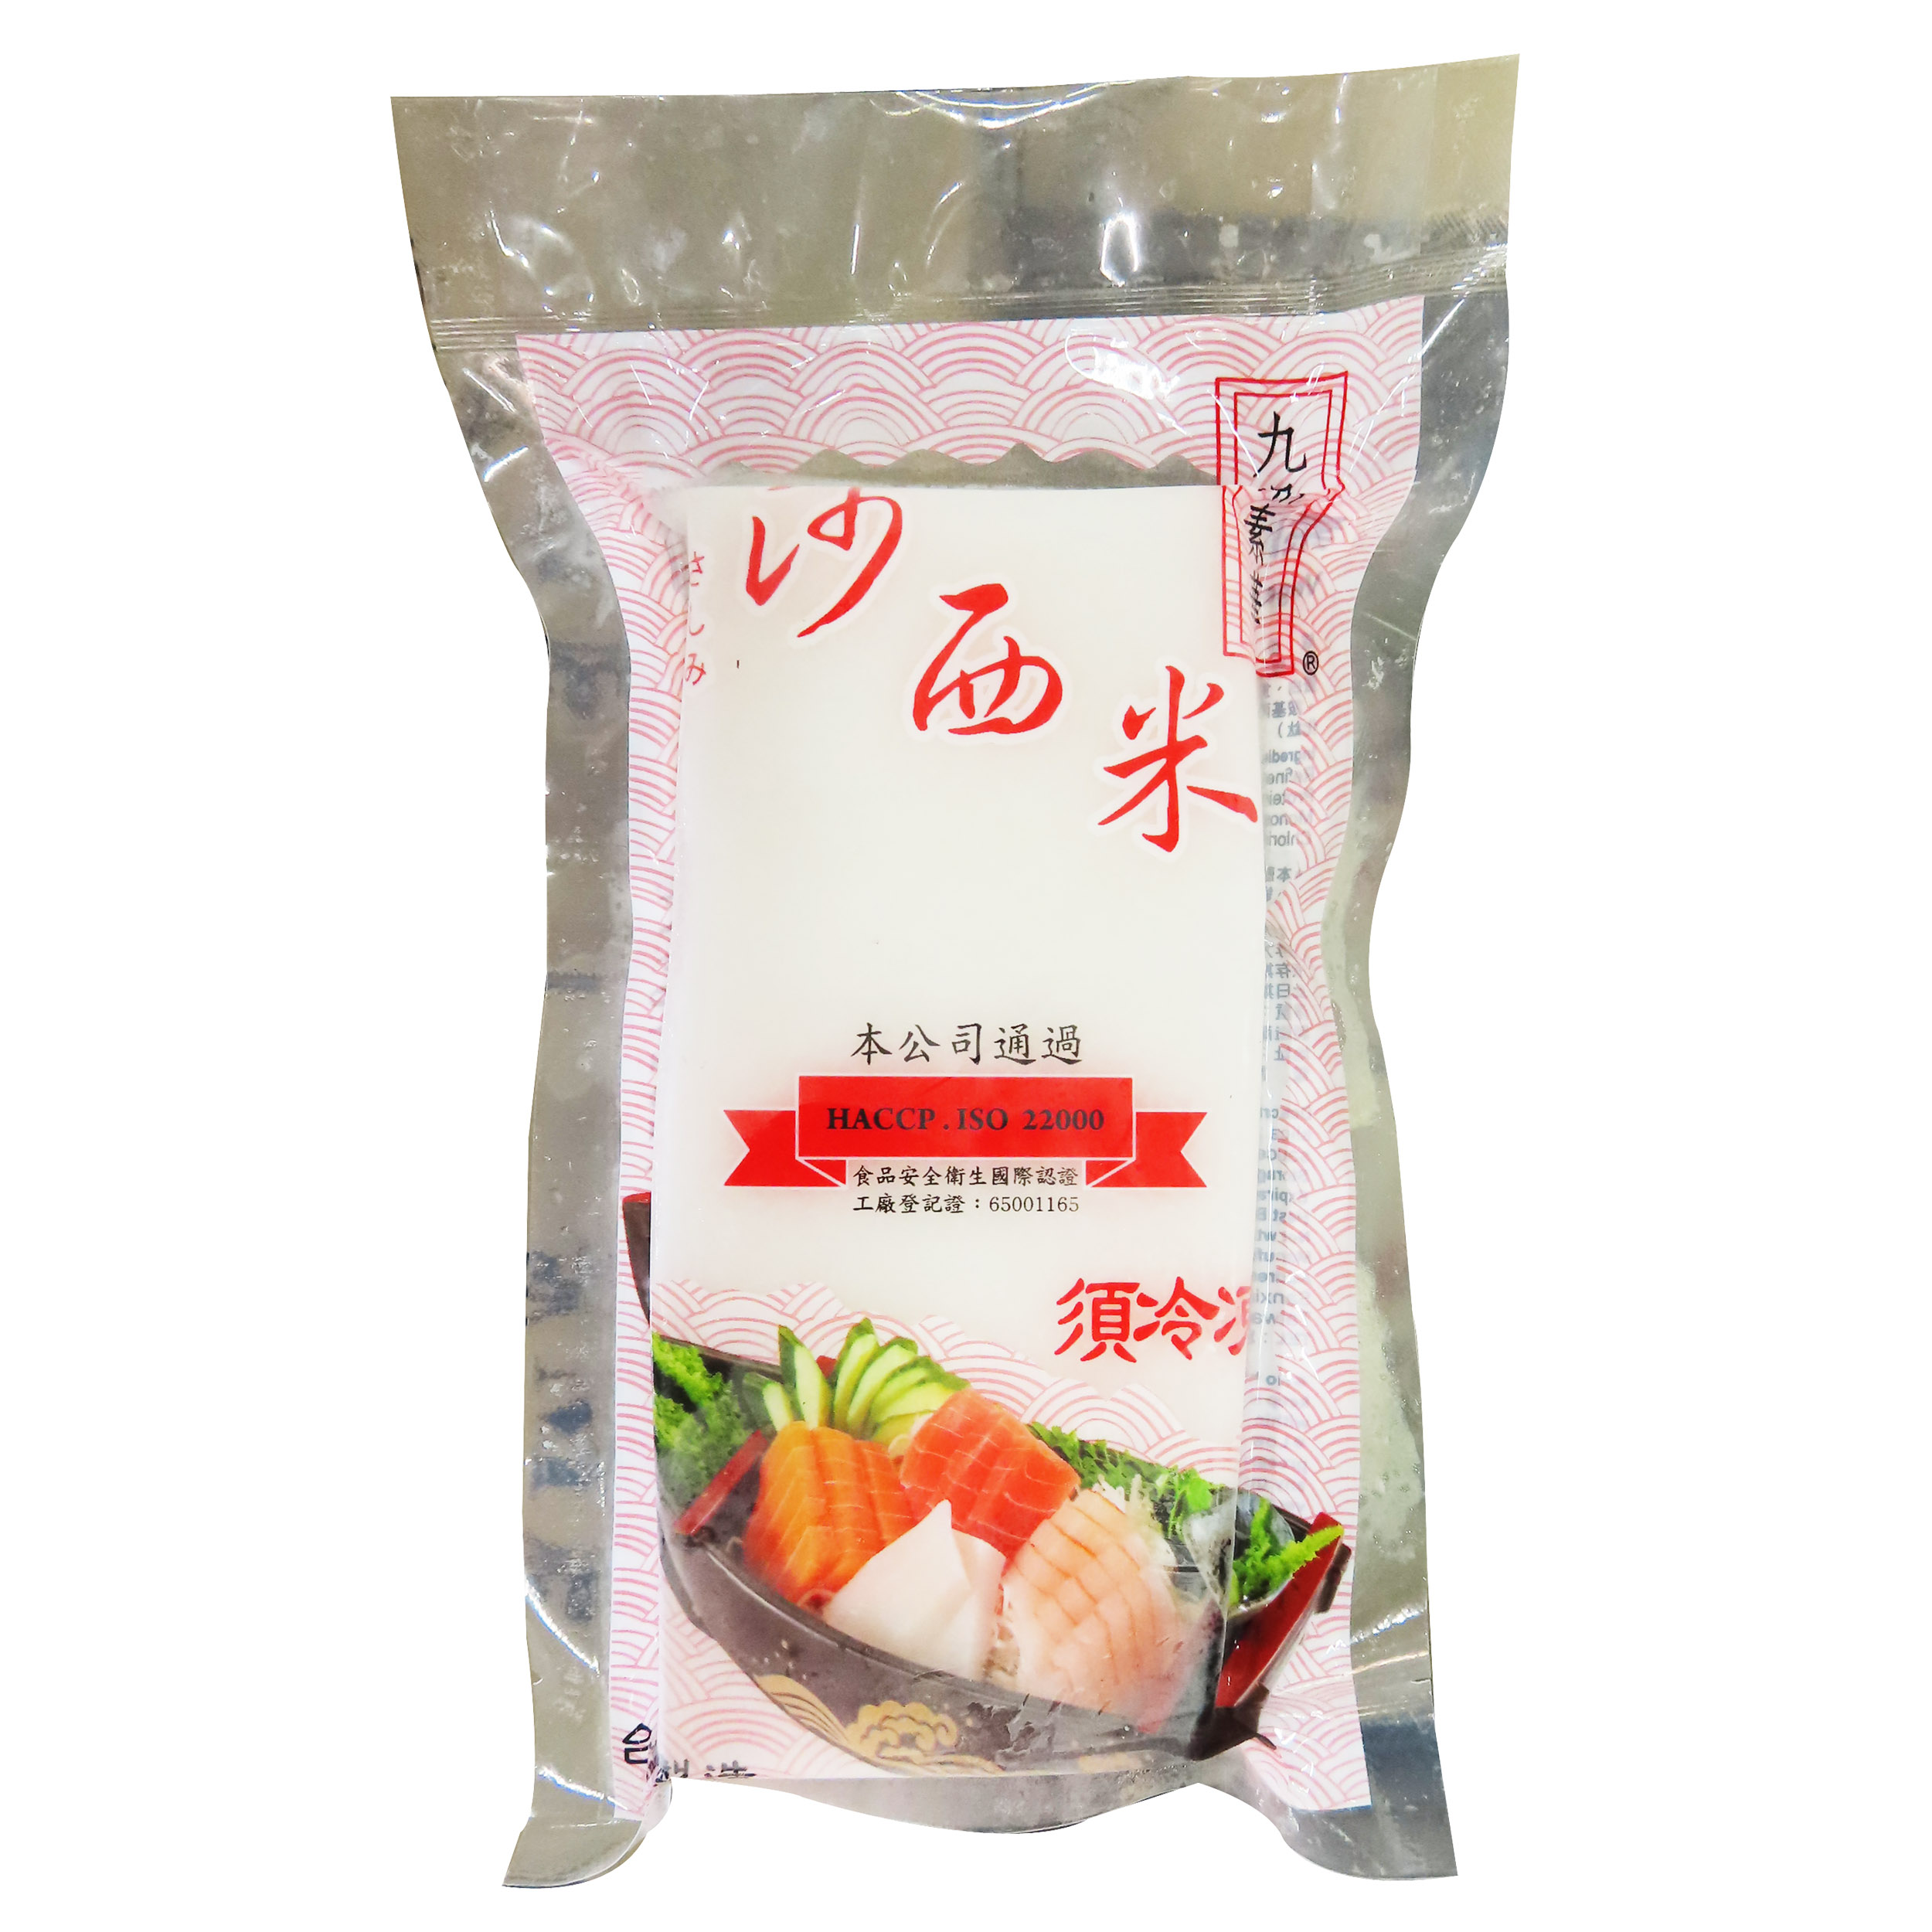 Image Veggie Sashimi Squid 九鼎华-素花枝生鱼片 220grams